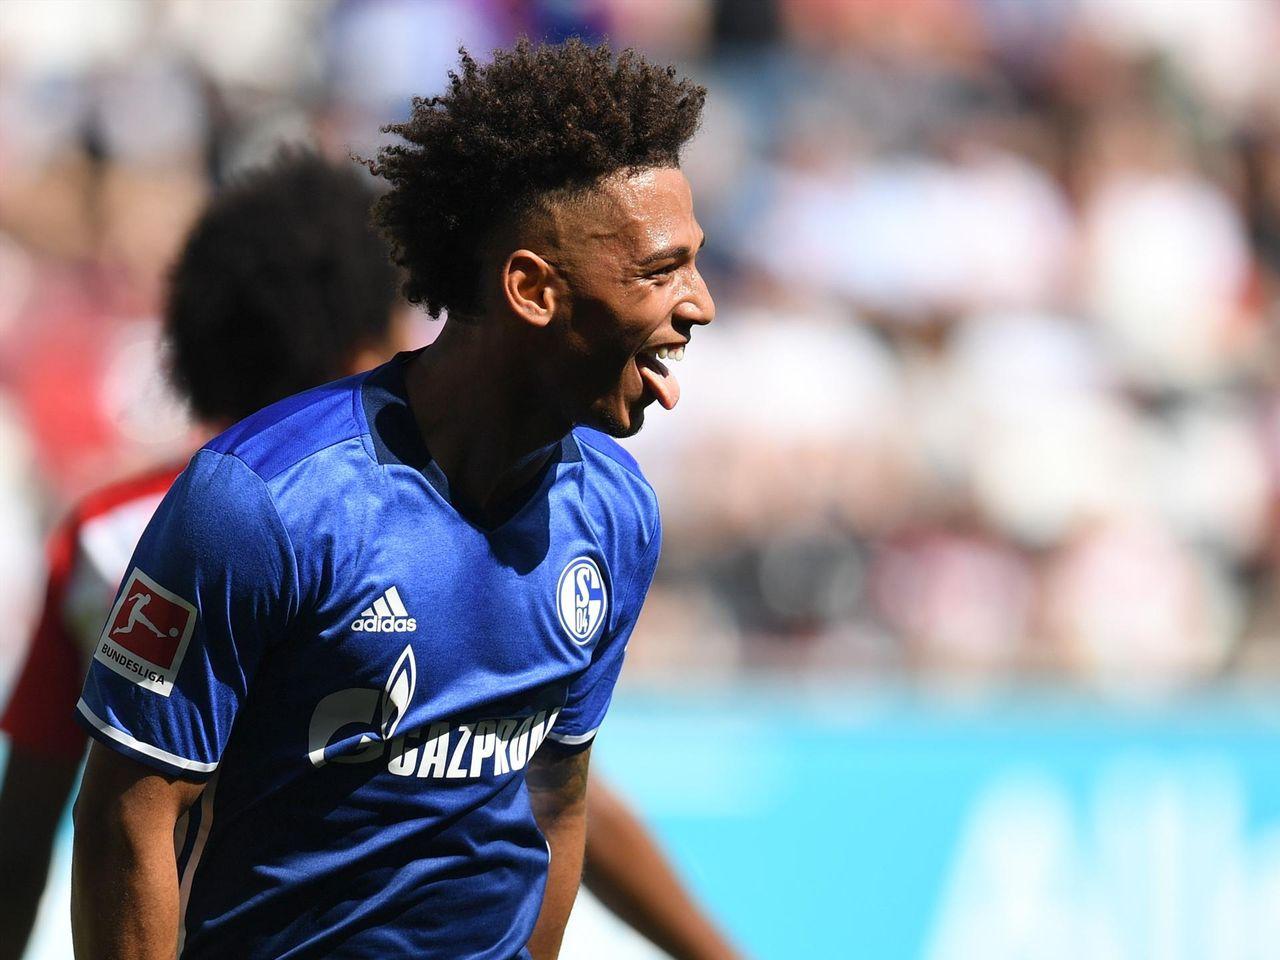 Colpo Paris Saint-Germain: preso Thilo Kehrer, talentuoso difensore ...